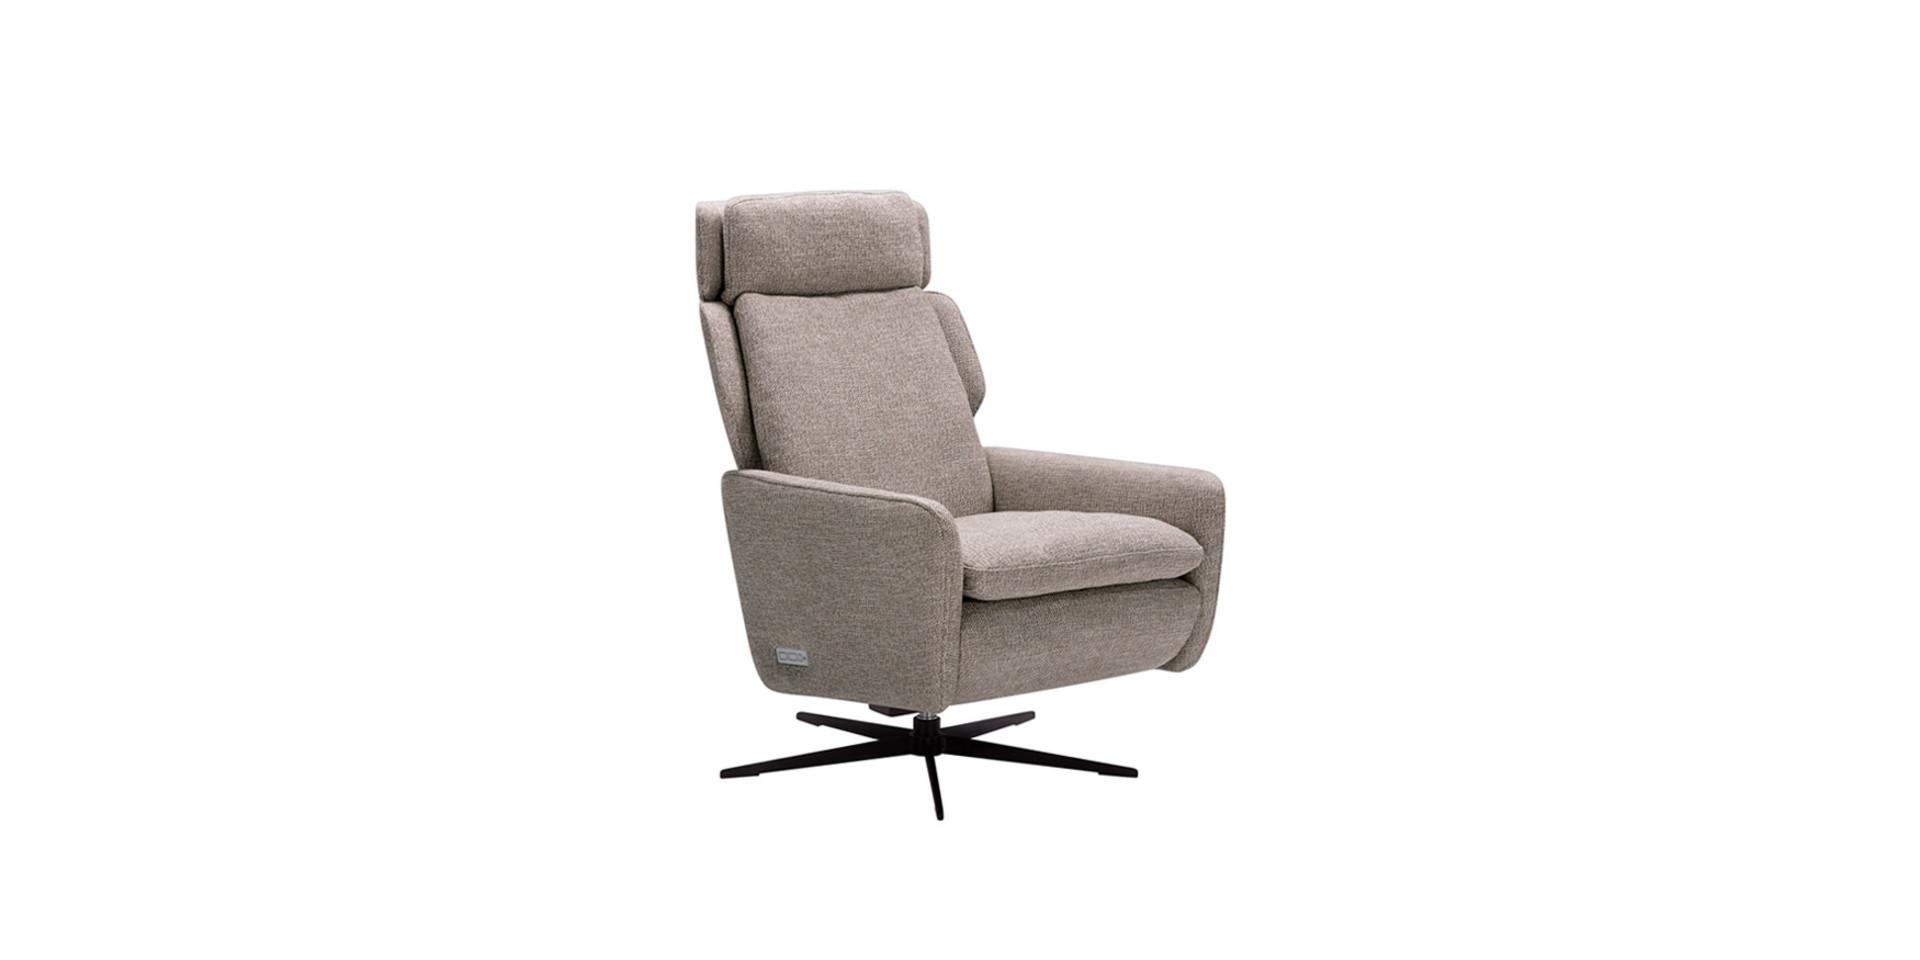 EVY_RELAX_armchair_tweedy3_light_brown_2